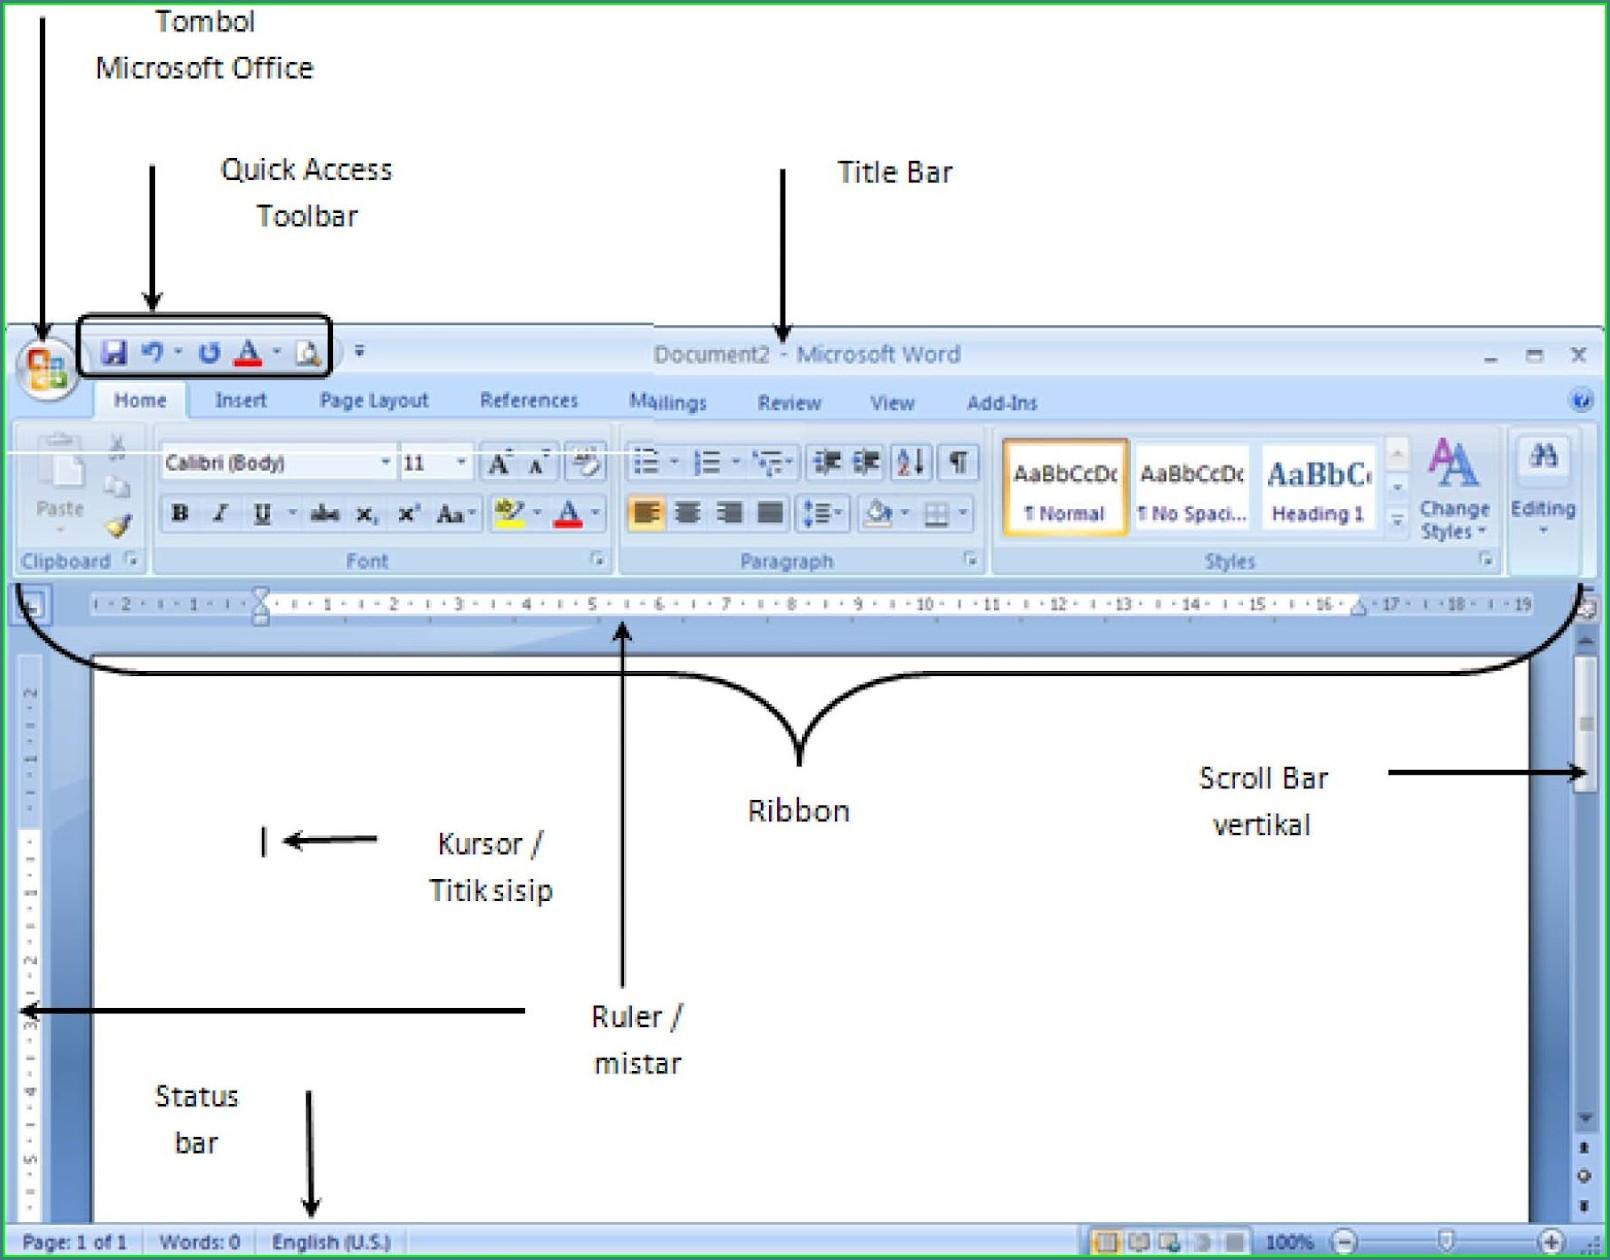 Microsoft Word Ribbon Worksheet